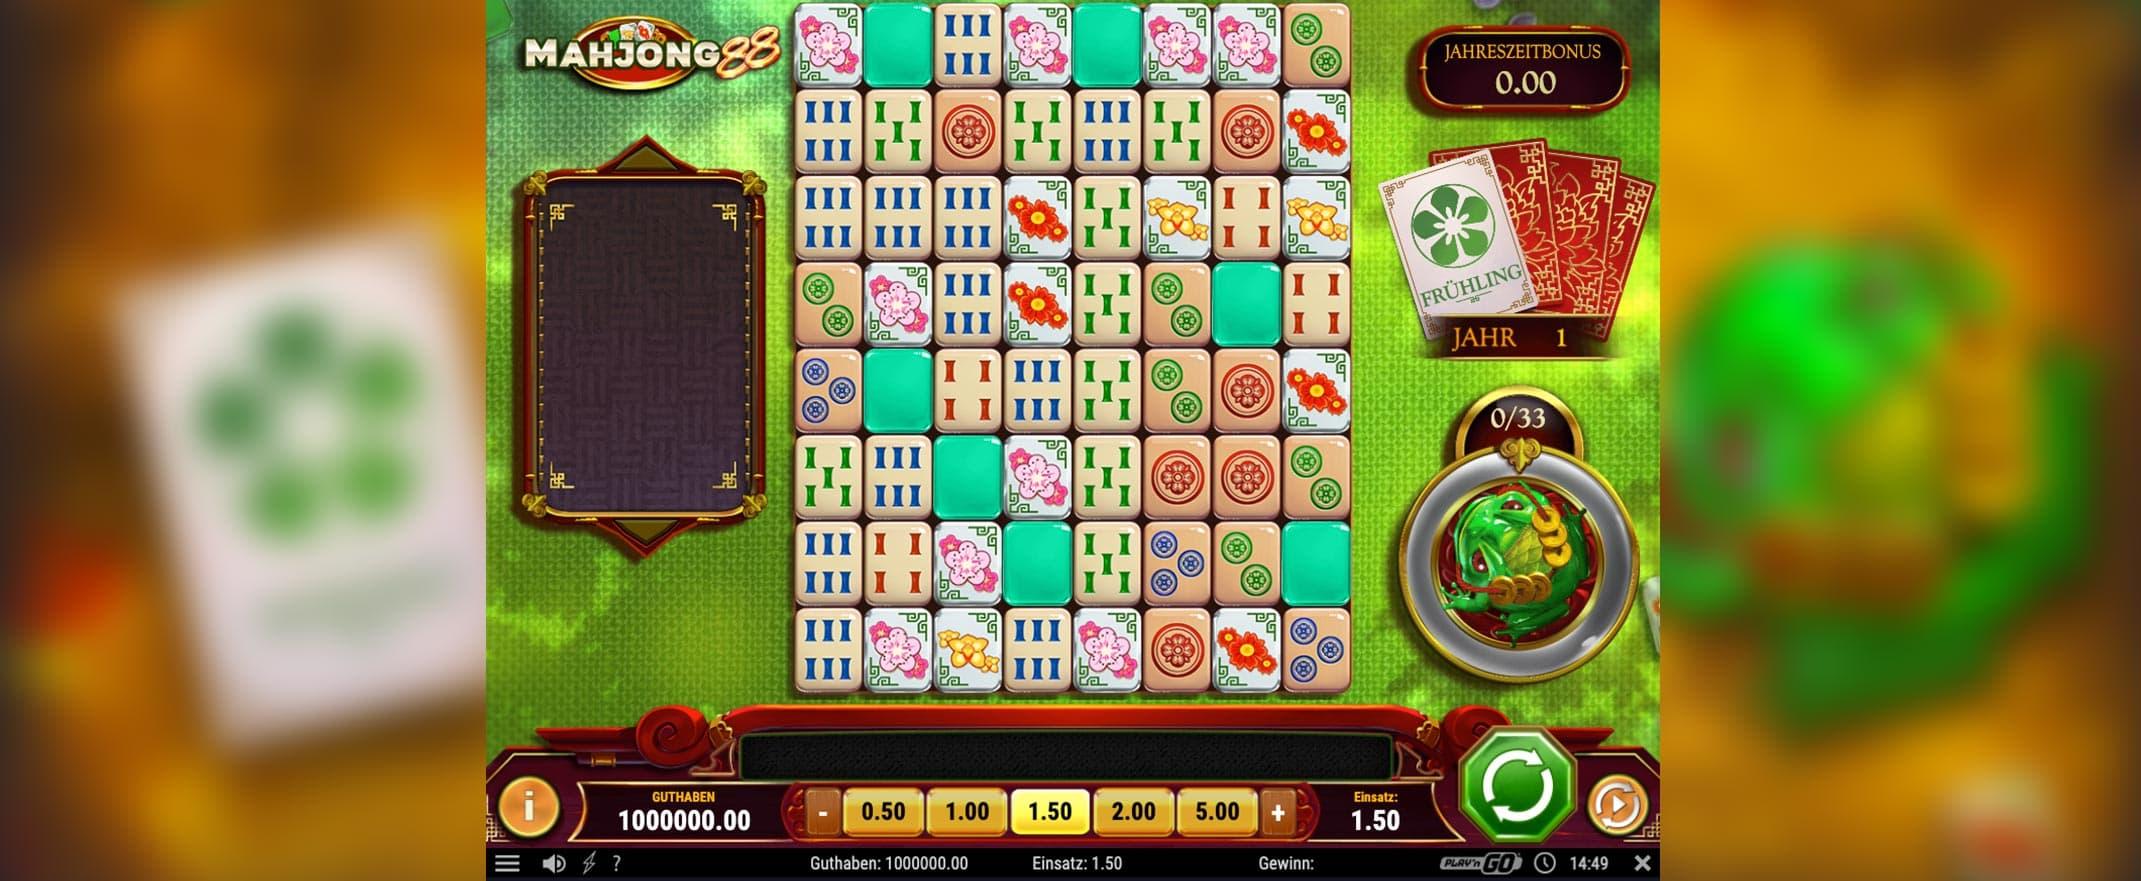 Mahjong Slots beautiful interface